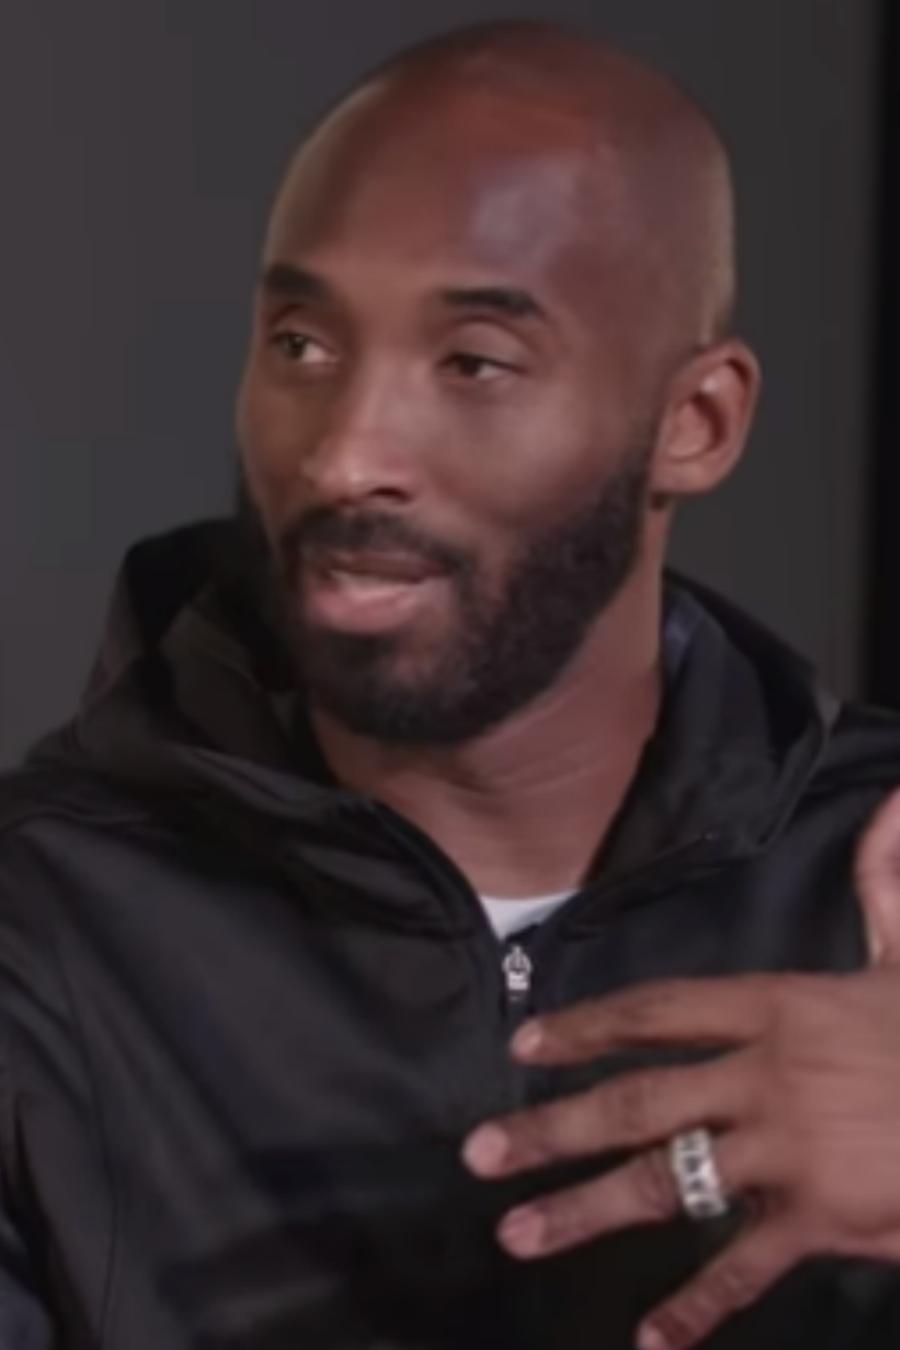 Kobe Bryant en entrevista con The Ringer en 2016